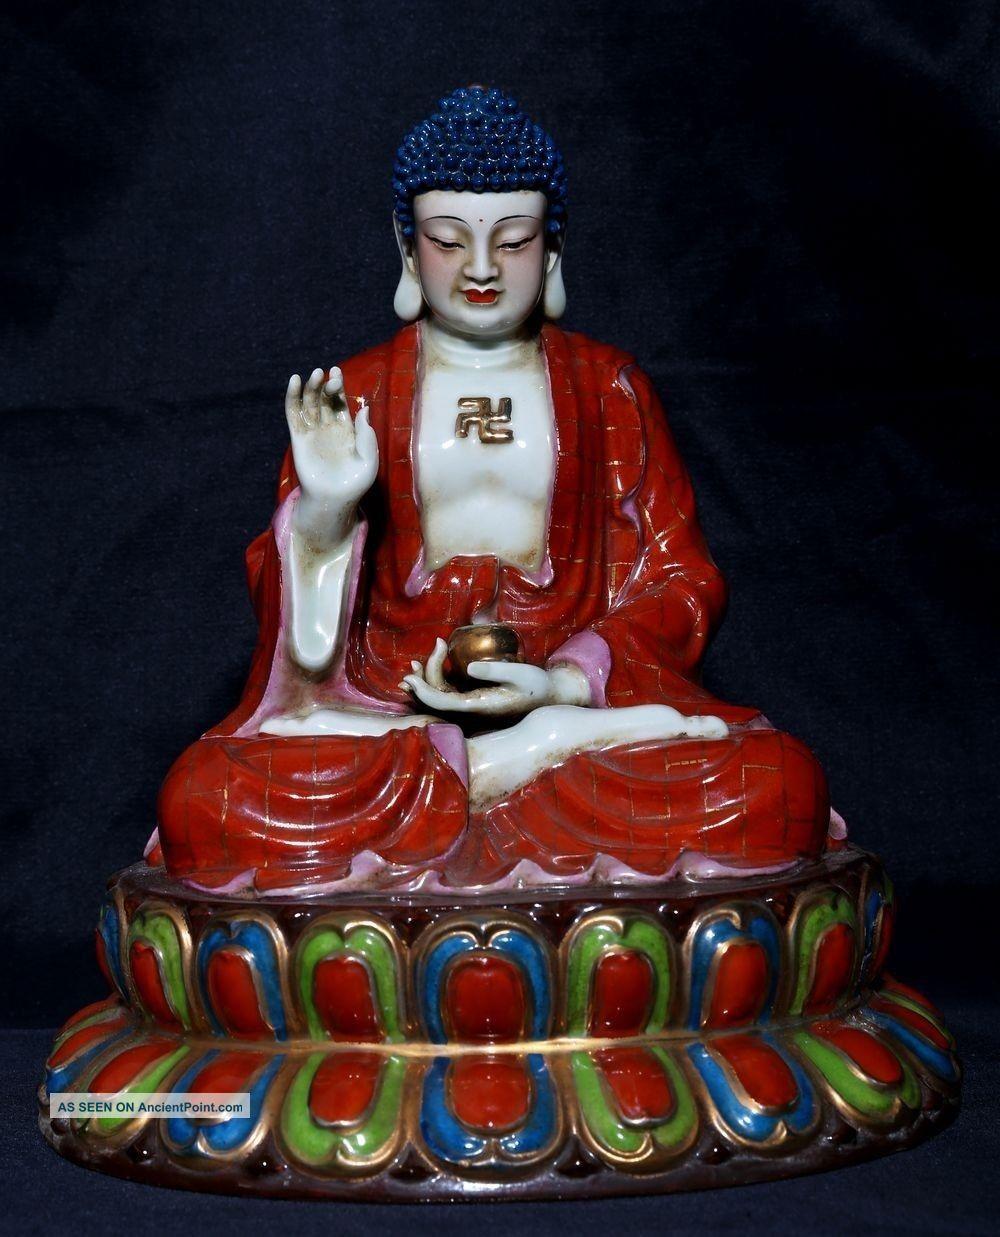 Large Rare Antique Chinese Glaze Porcelain Buddha Statue Fa335 Figurines & Statues photo